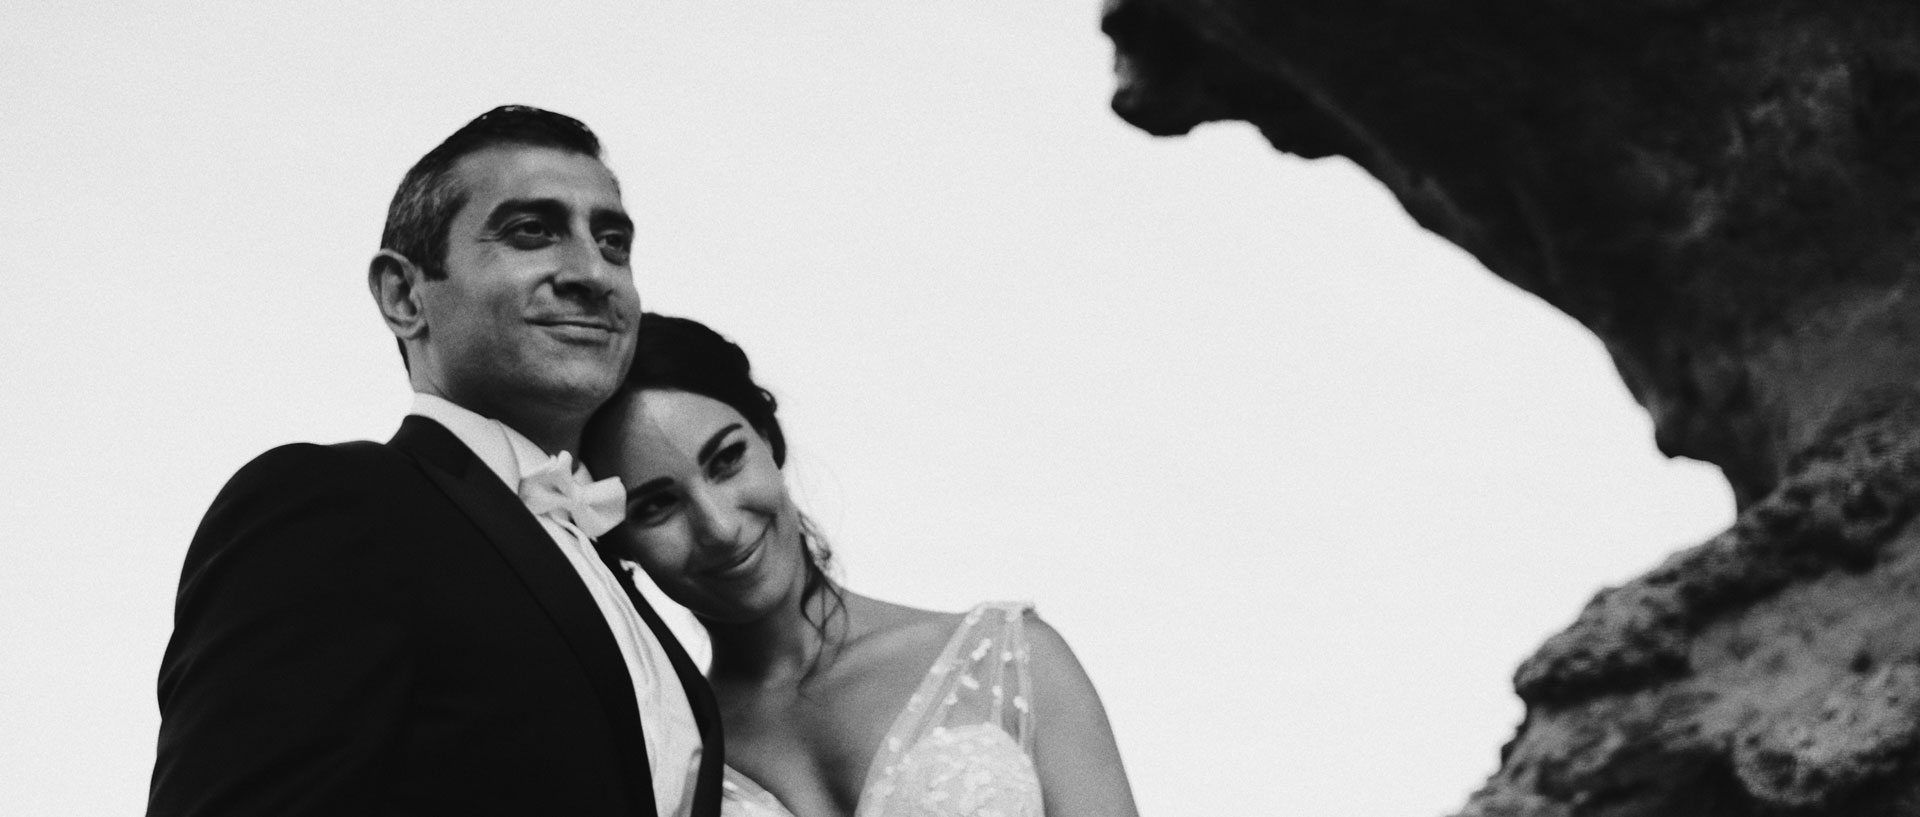 Jad & Natasha - Prestigious french-american lebanese weddingCasino de Biarritz